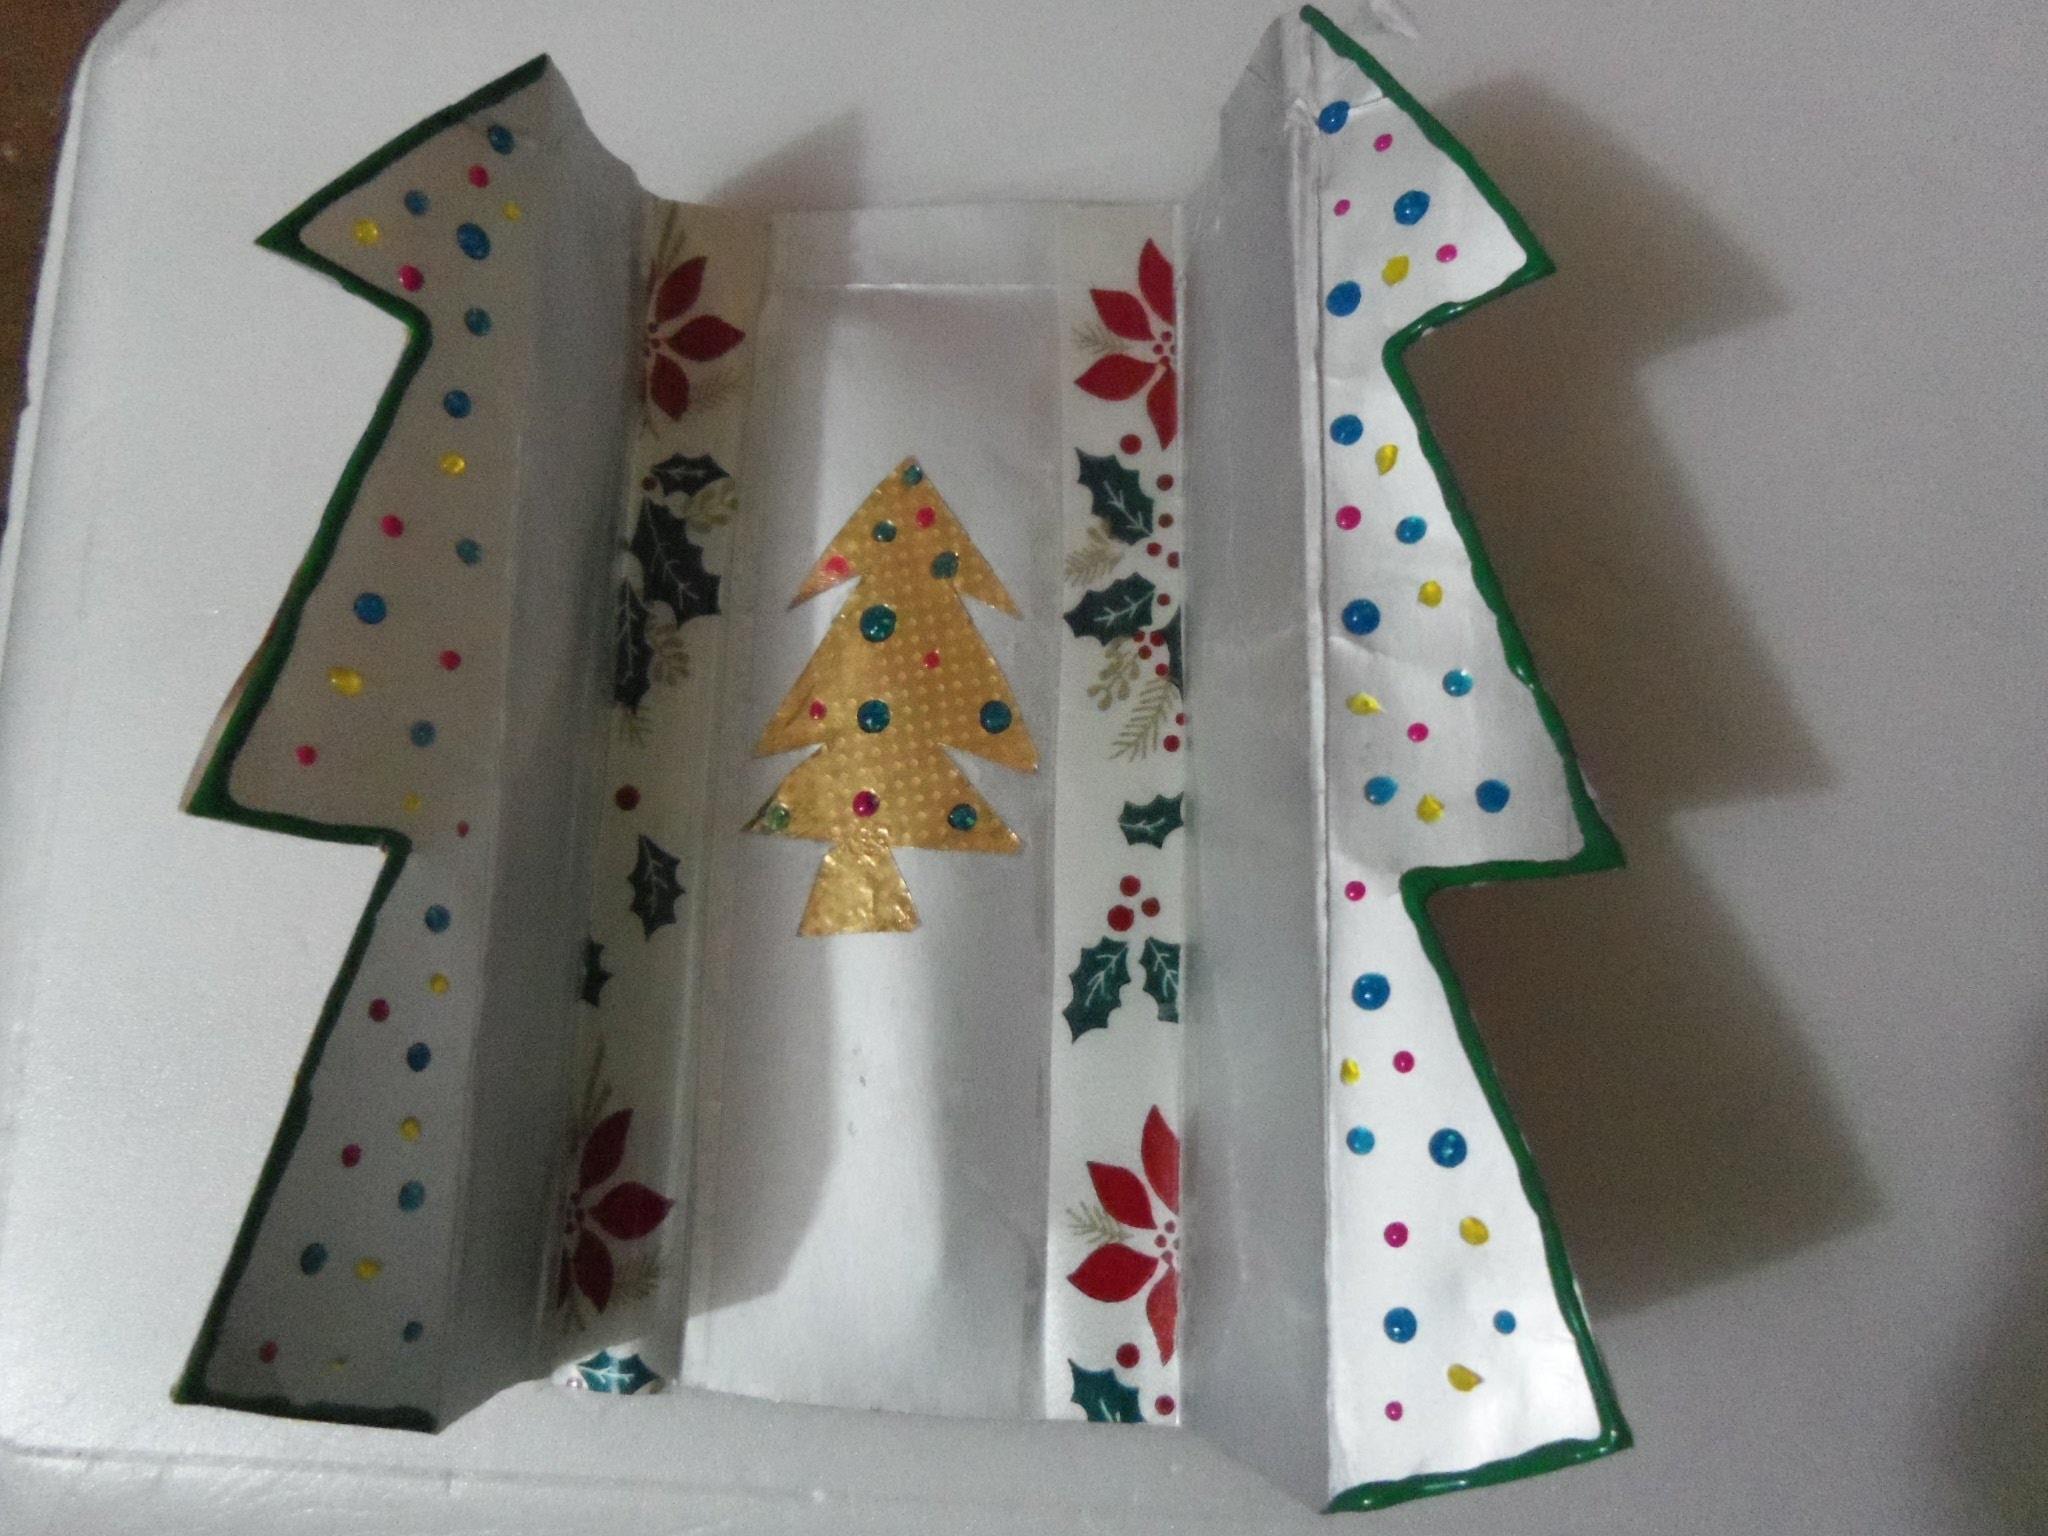 Tarjeta Navideña reciclada de tetrapack